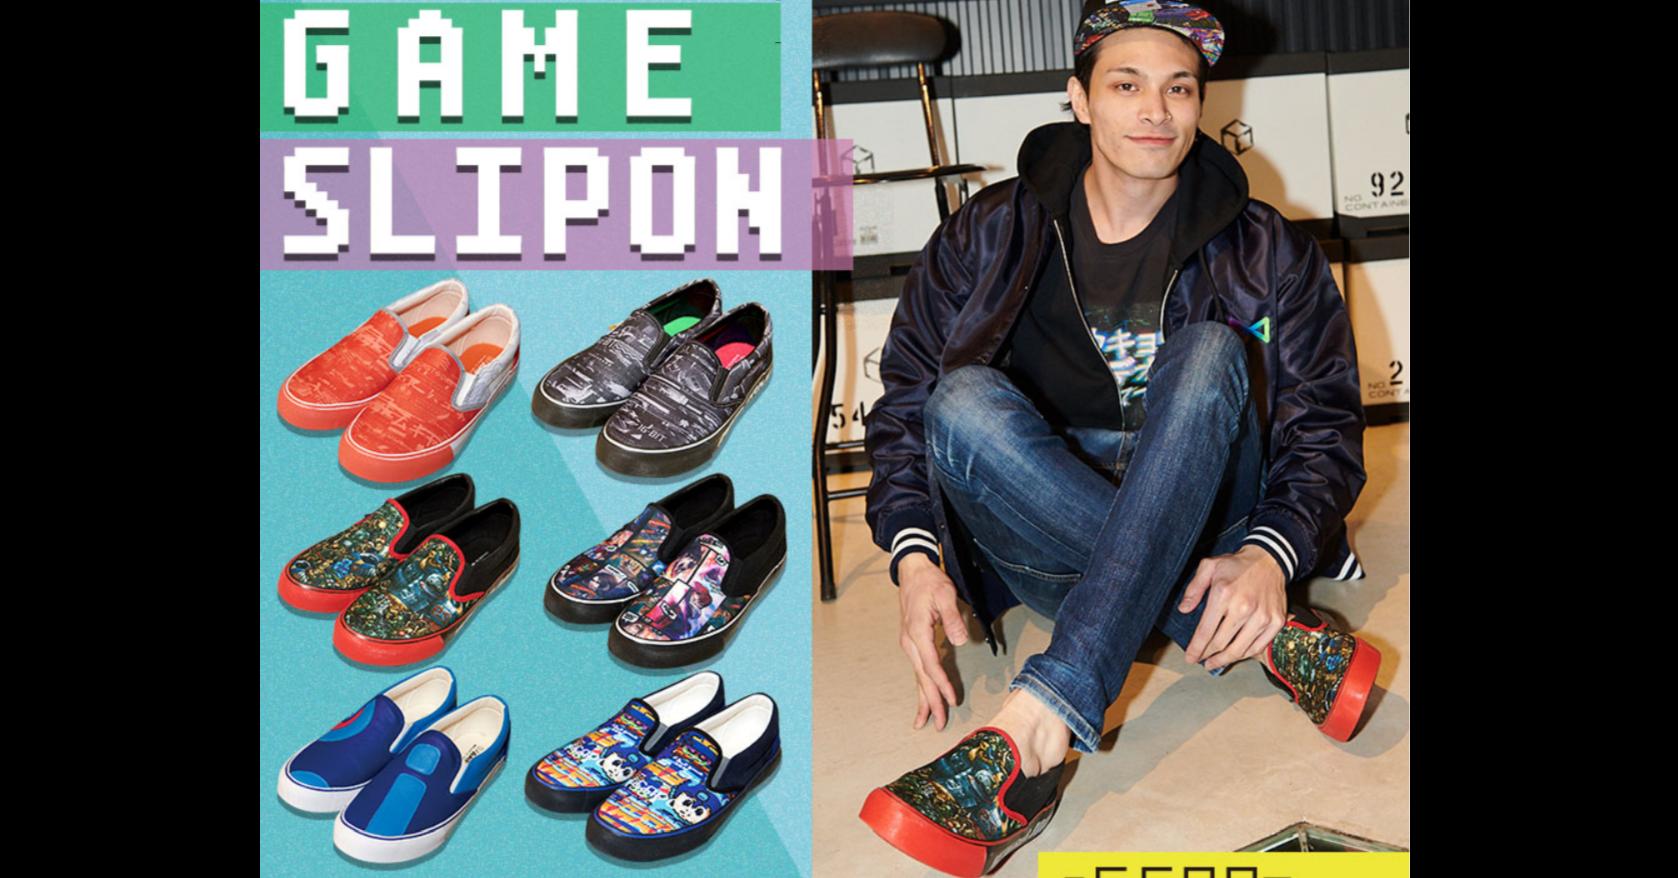 Sneakers, Shoe, Advertising, Sandal, Fashion, Product, Brand, sneakers, Footwear, Shoe, Plimsoll shoe, Slipper, Sandal, Athletic shoe, Style